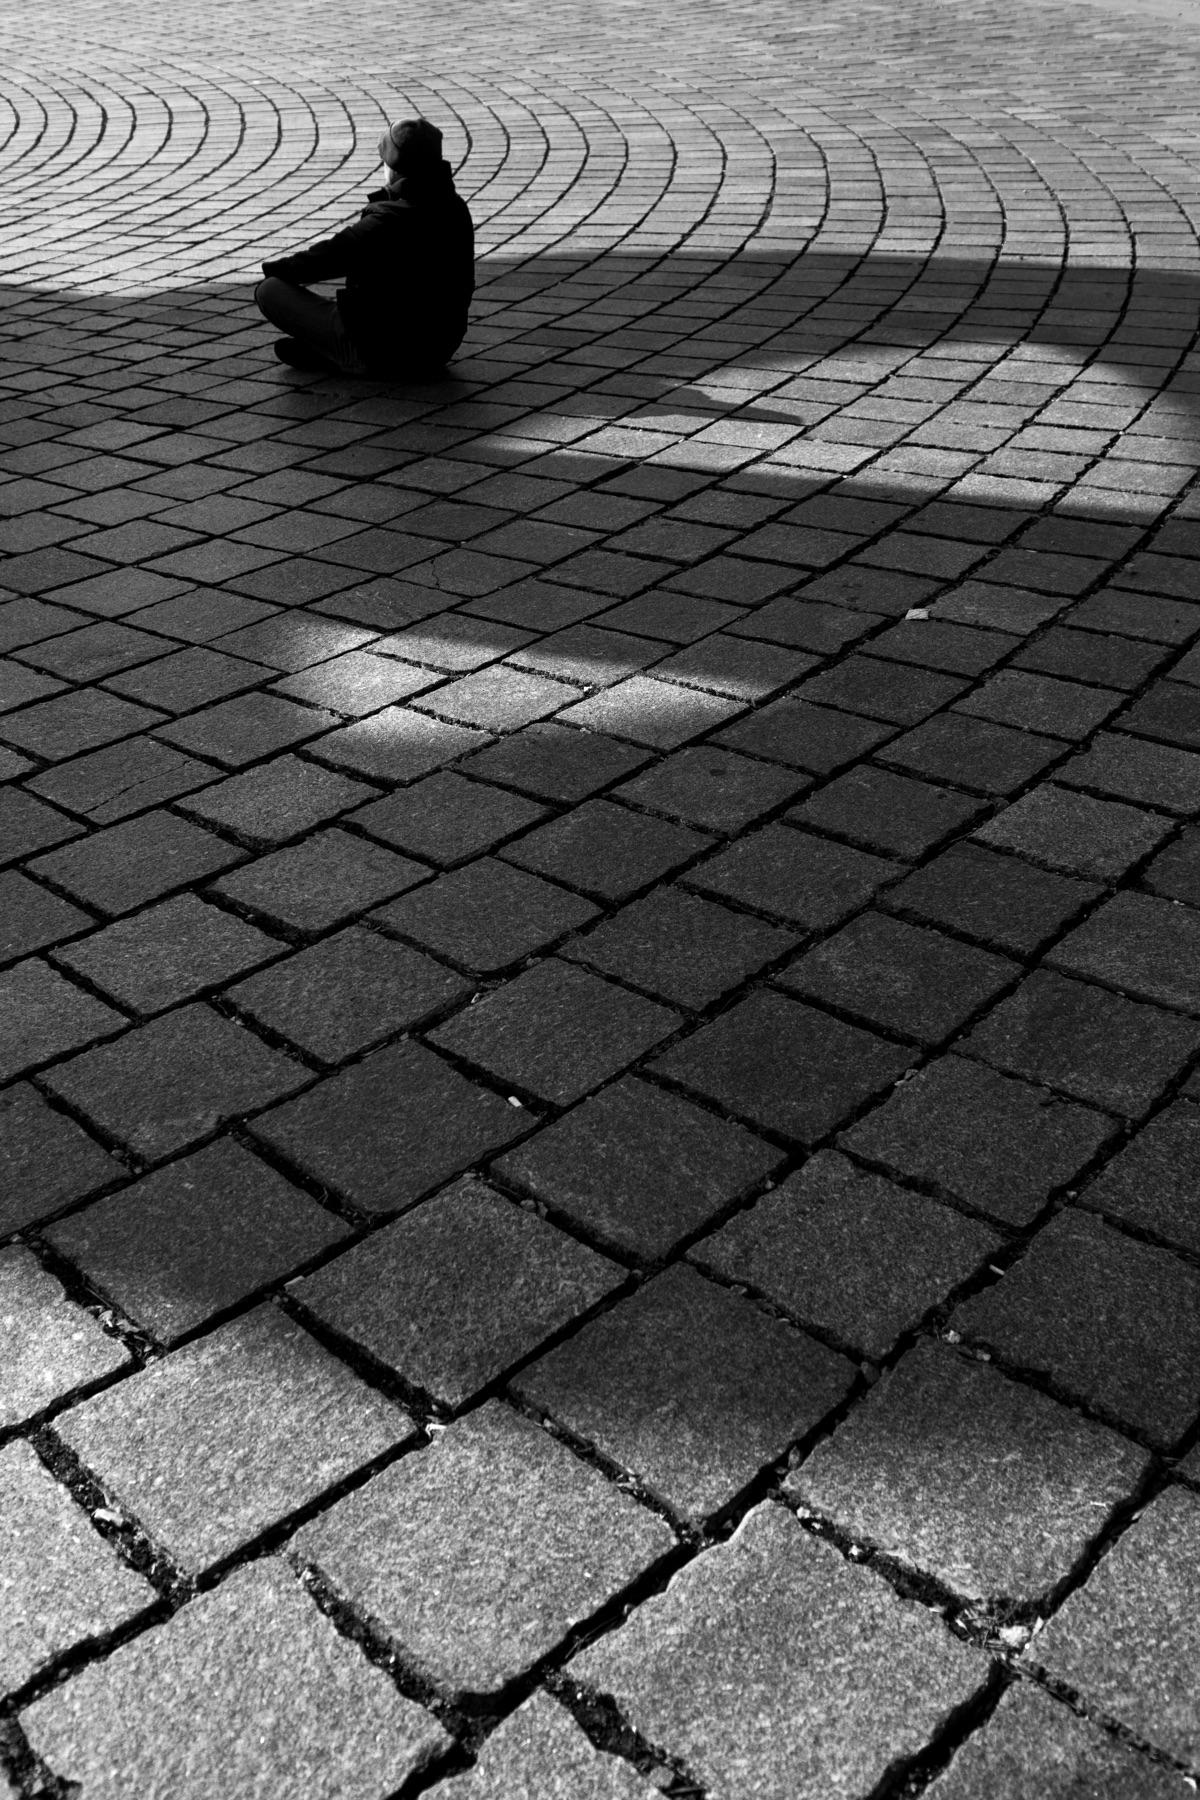 Relax - streetphotography, canon - jakegottman | ello